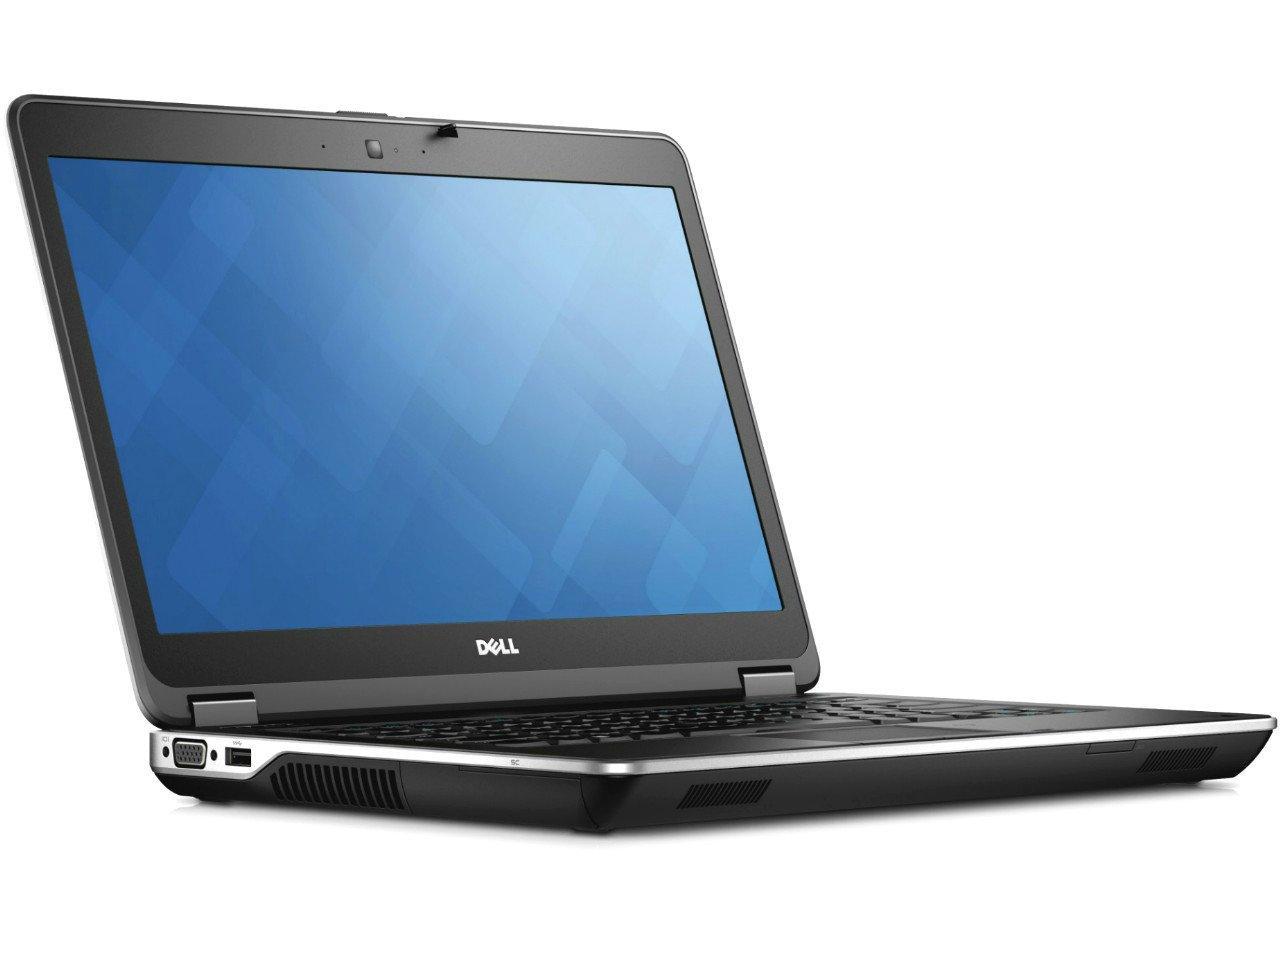 DELL Latitude E6440 - PC portátil - 14 - Gris (Intel Core i5 - 4300 M/2.60 GHz, 8 GB de RAM, SSD 120 GB, grabadora DVD, HDMI, Webcam, WiFi, ...